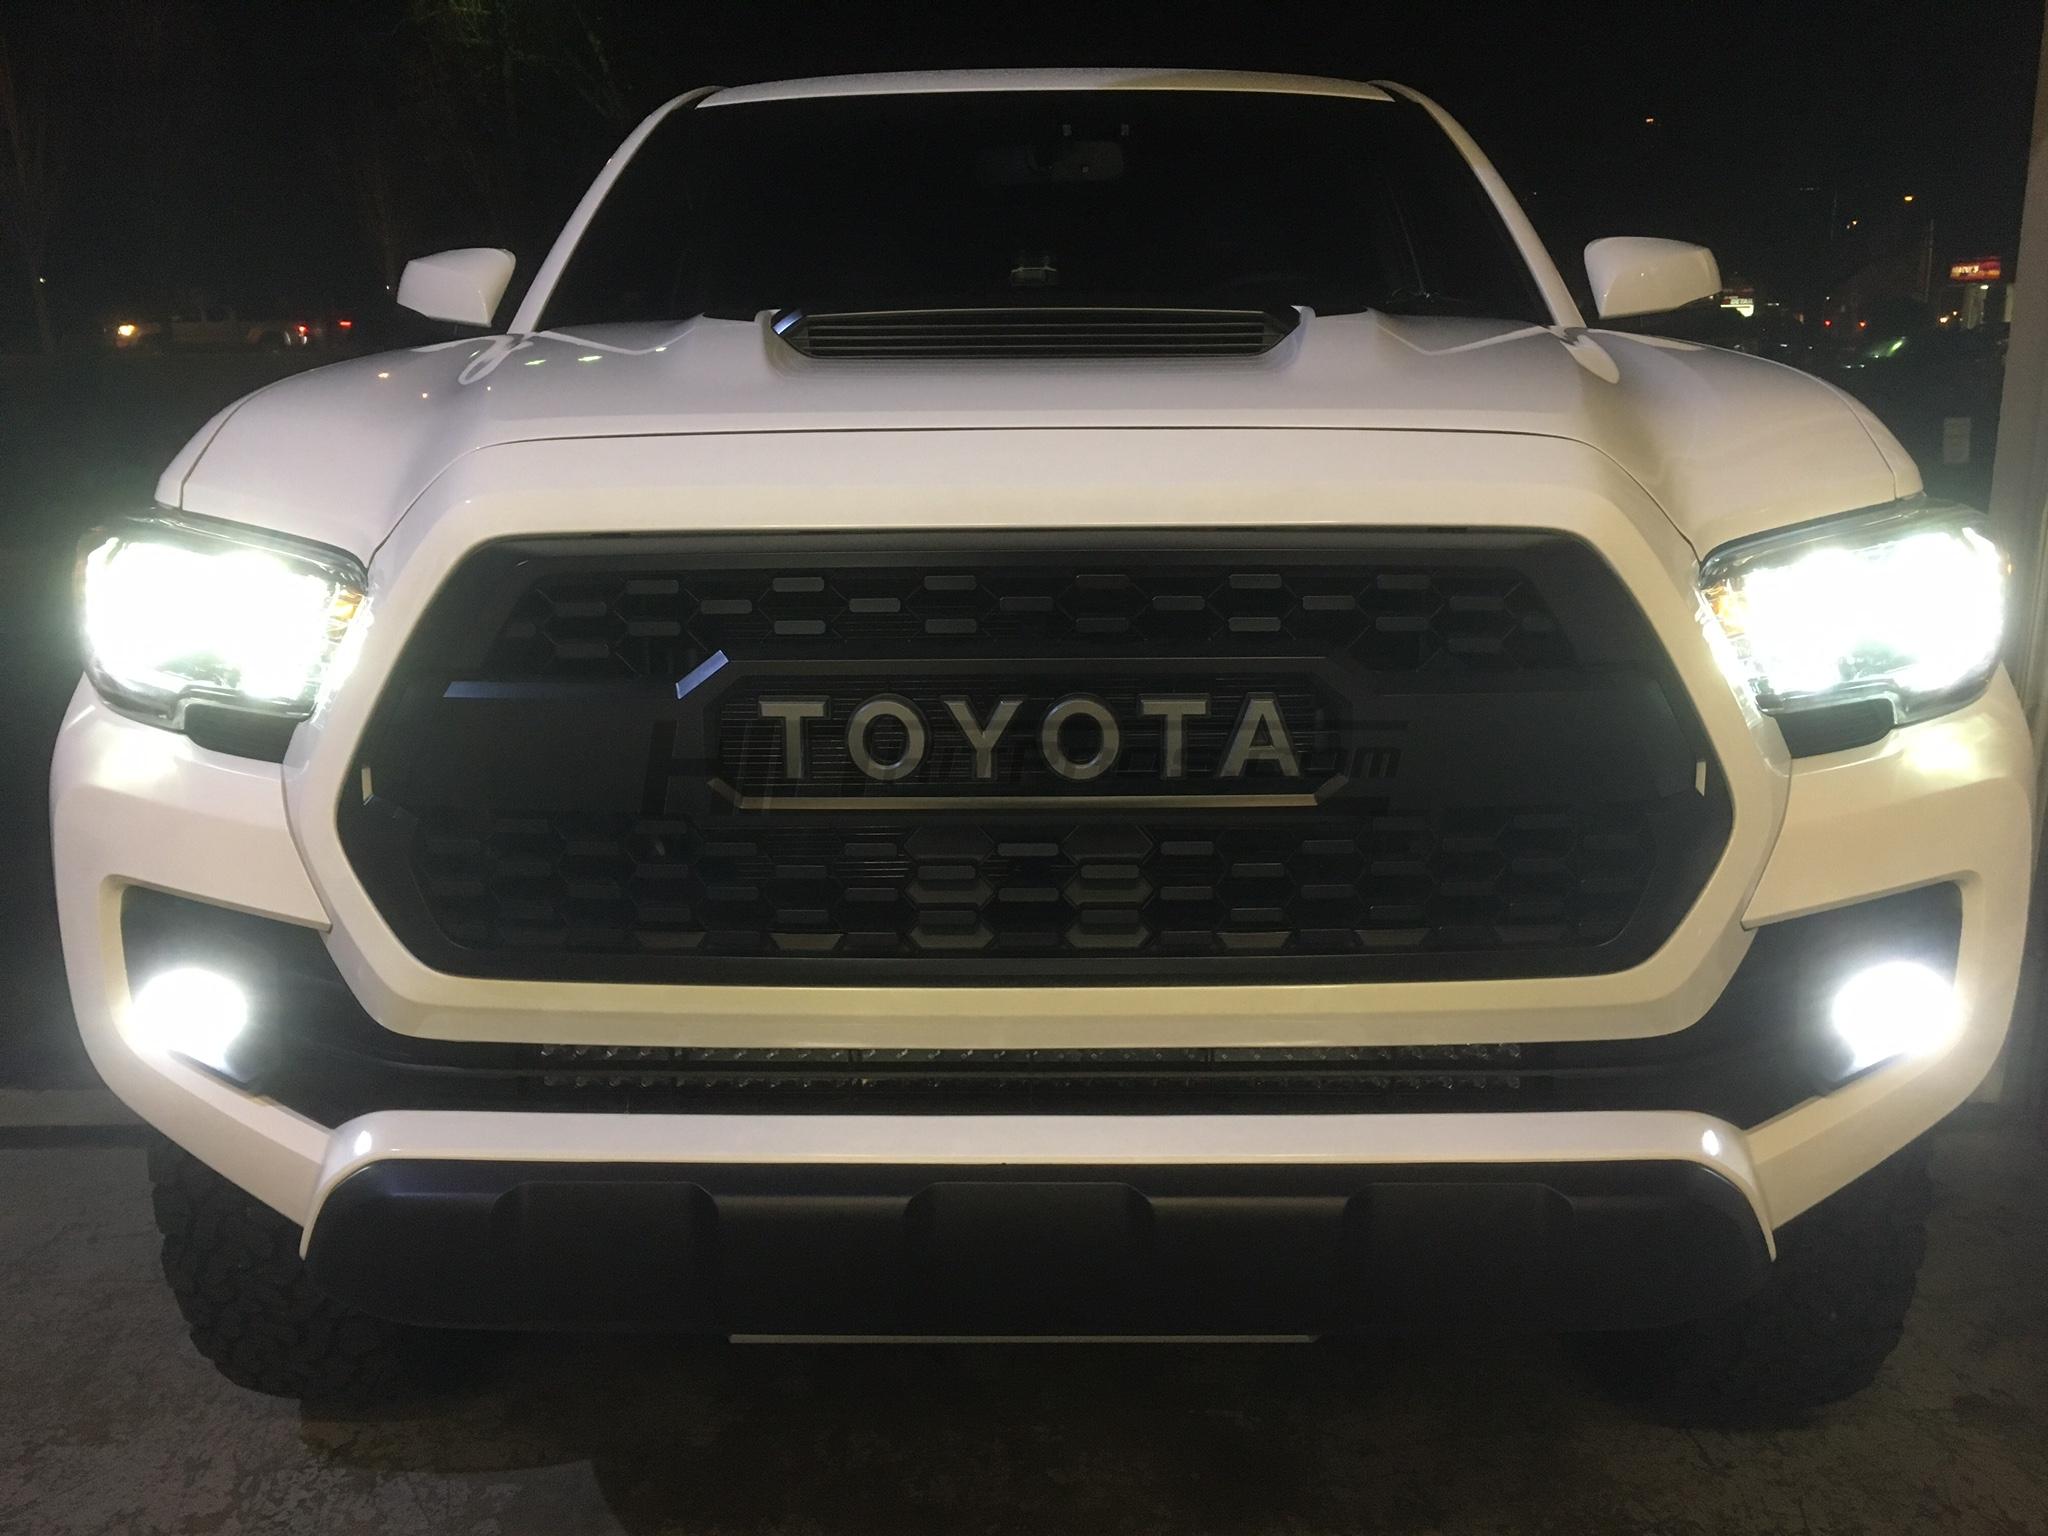 MORIMOTO XB LED Fog Lights TOYOTA OVAL Tacoma Tundra 4Runner Camry Prius 2400LM